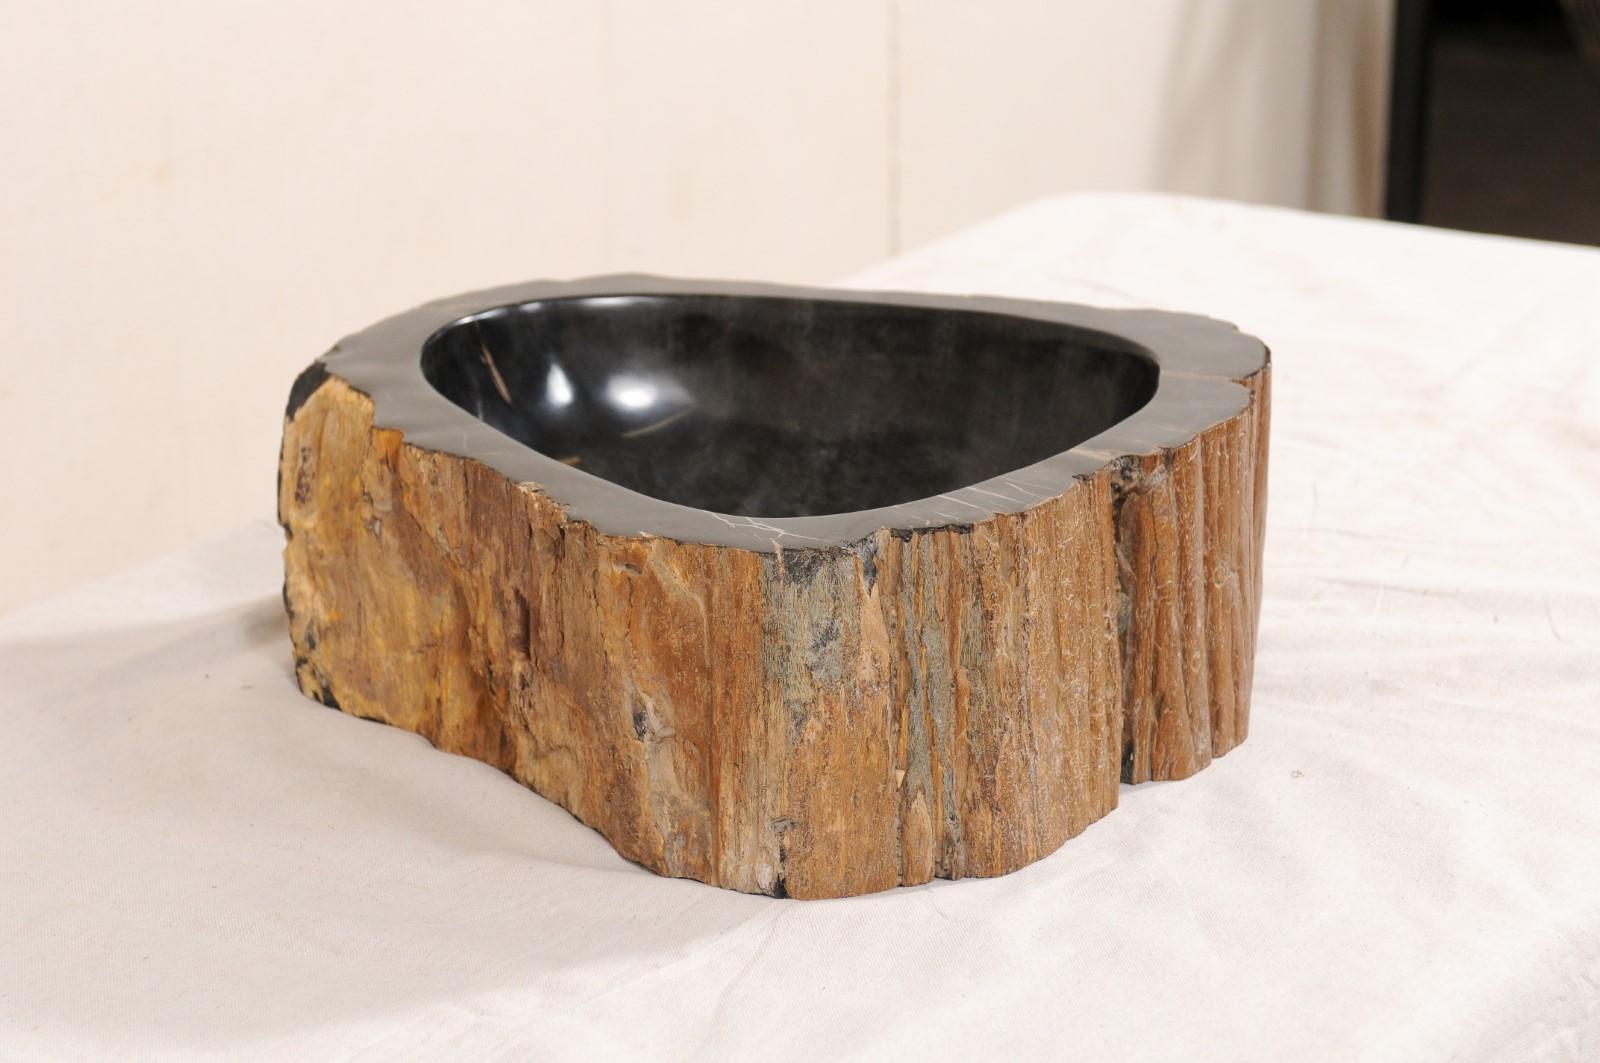 Black And Brown Polished Petrified Wood Sink